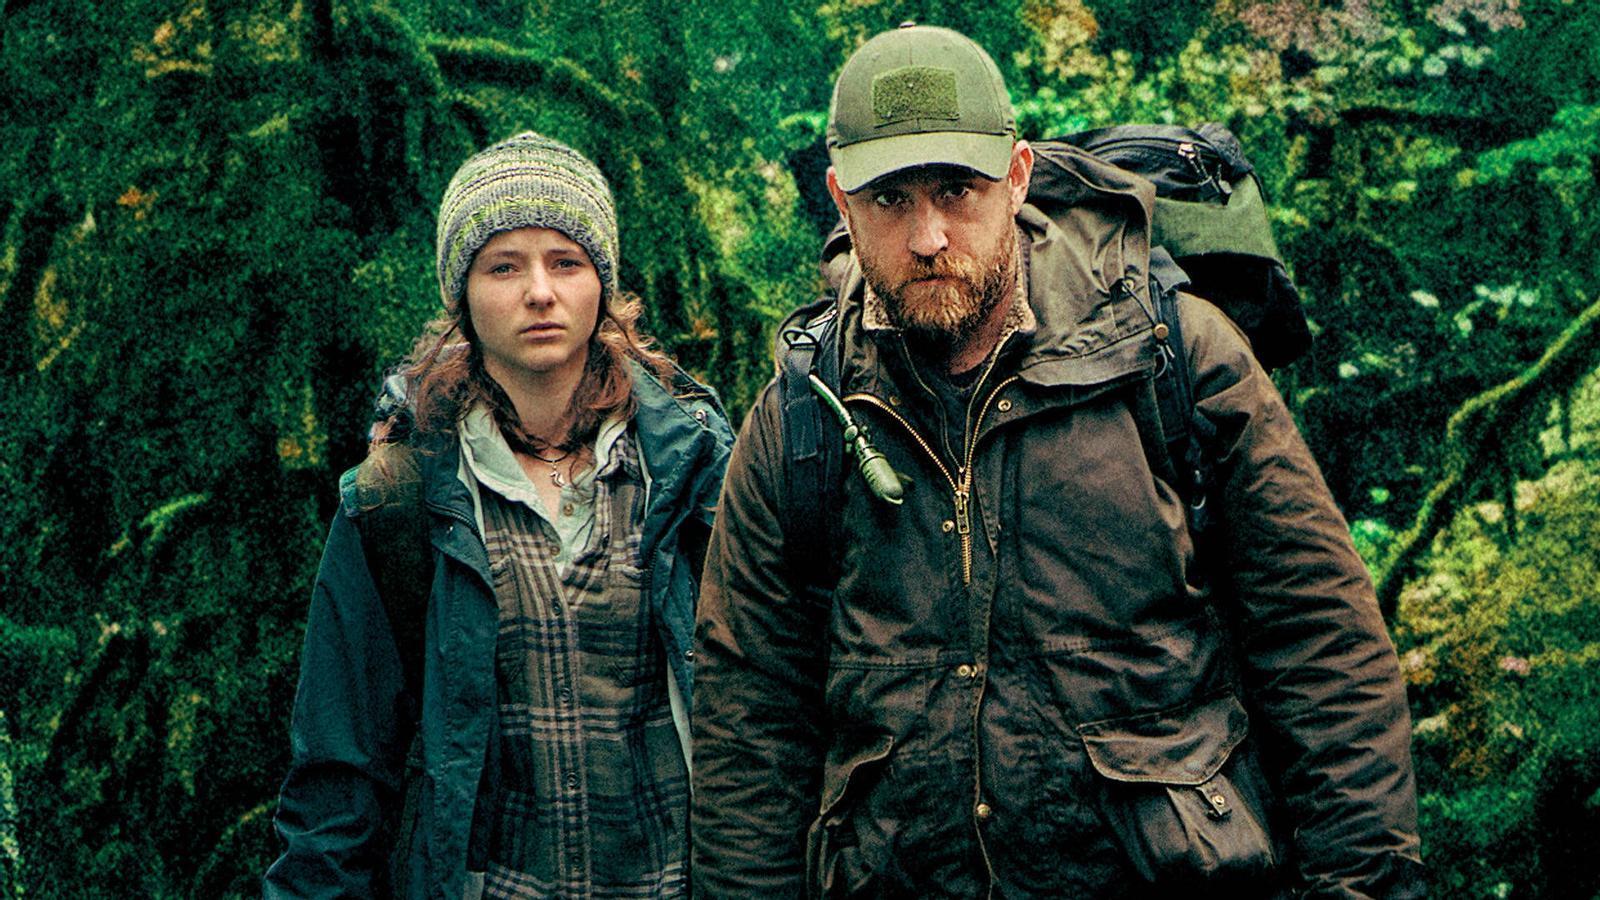 Thomasin McKenzie i Ben Foster a 'No dejes rastro (Leave no trace)'